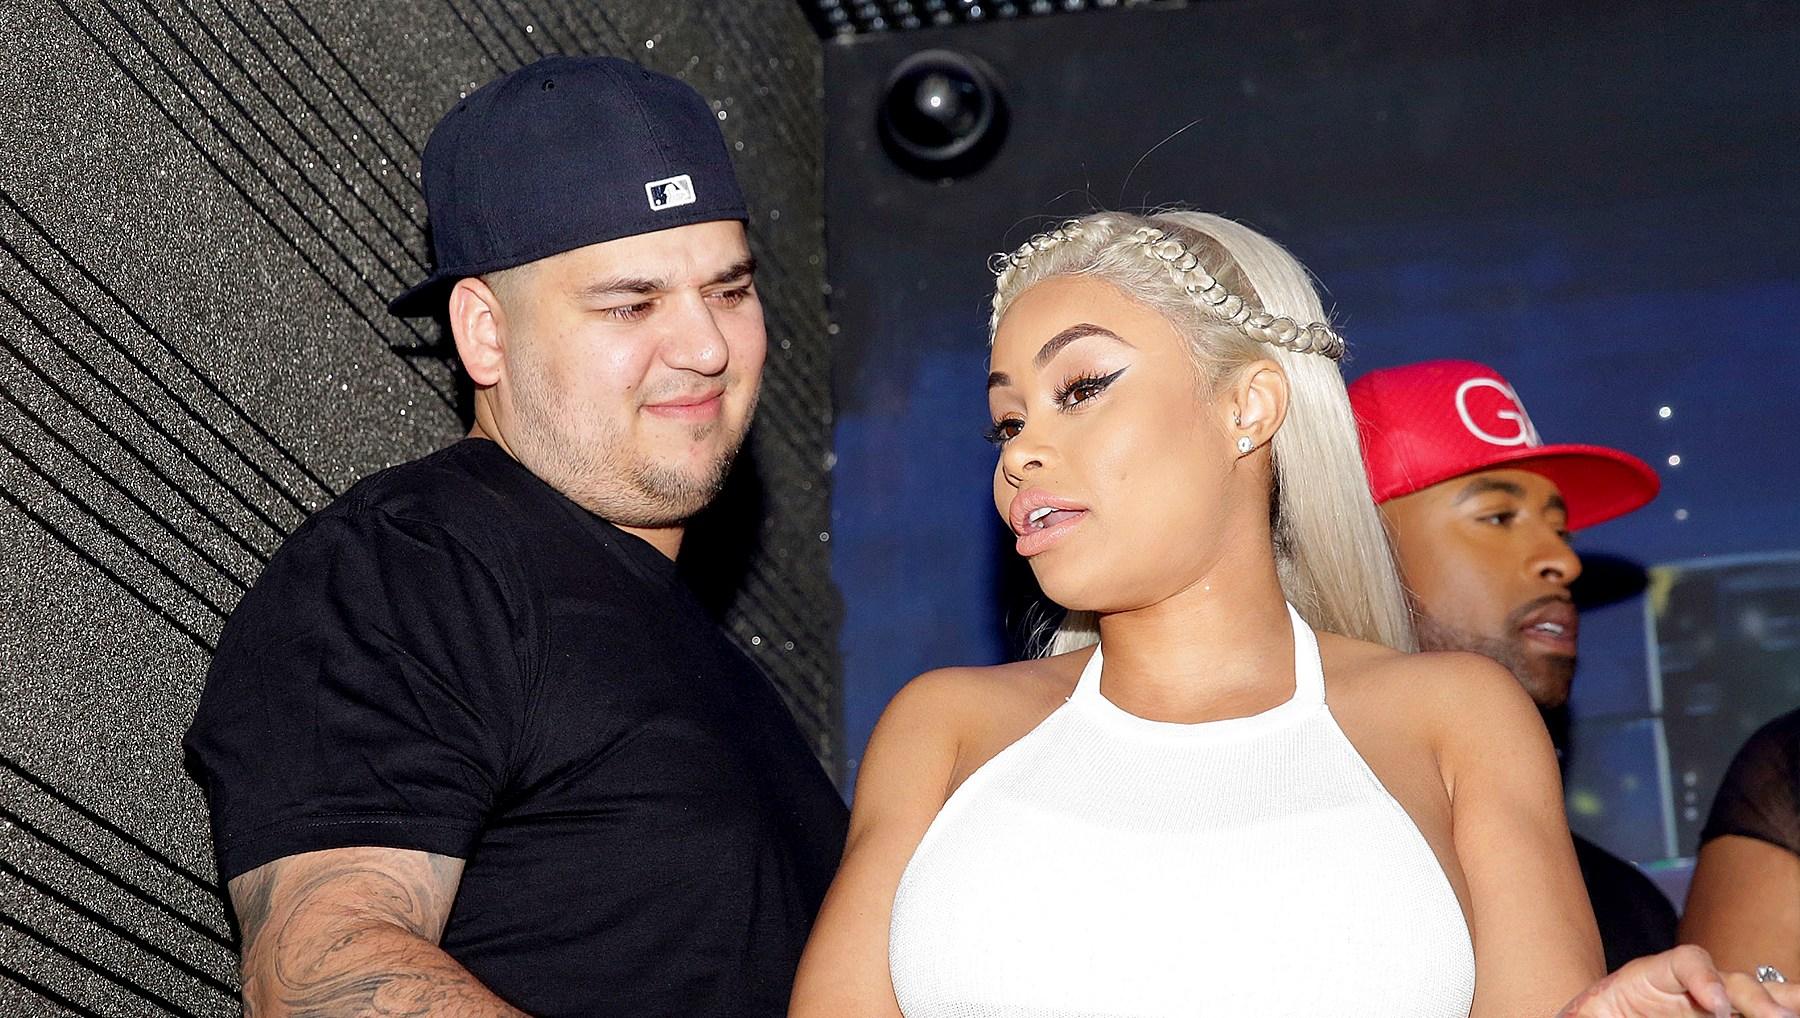 Rob Kardashian and Blac Chyna child support